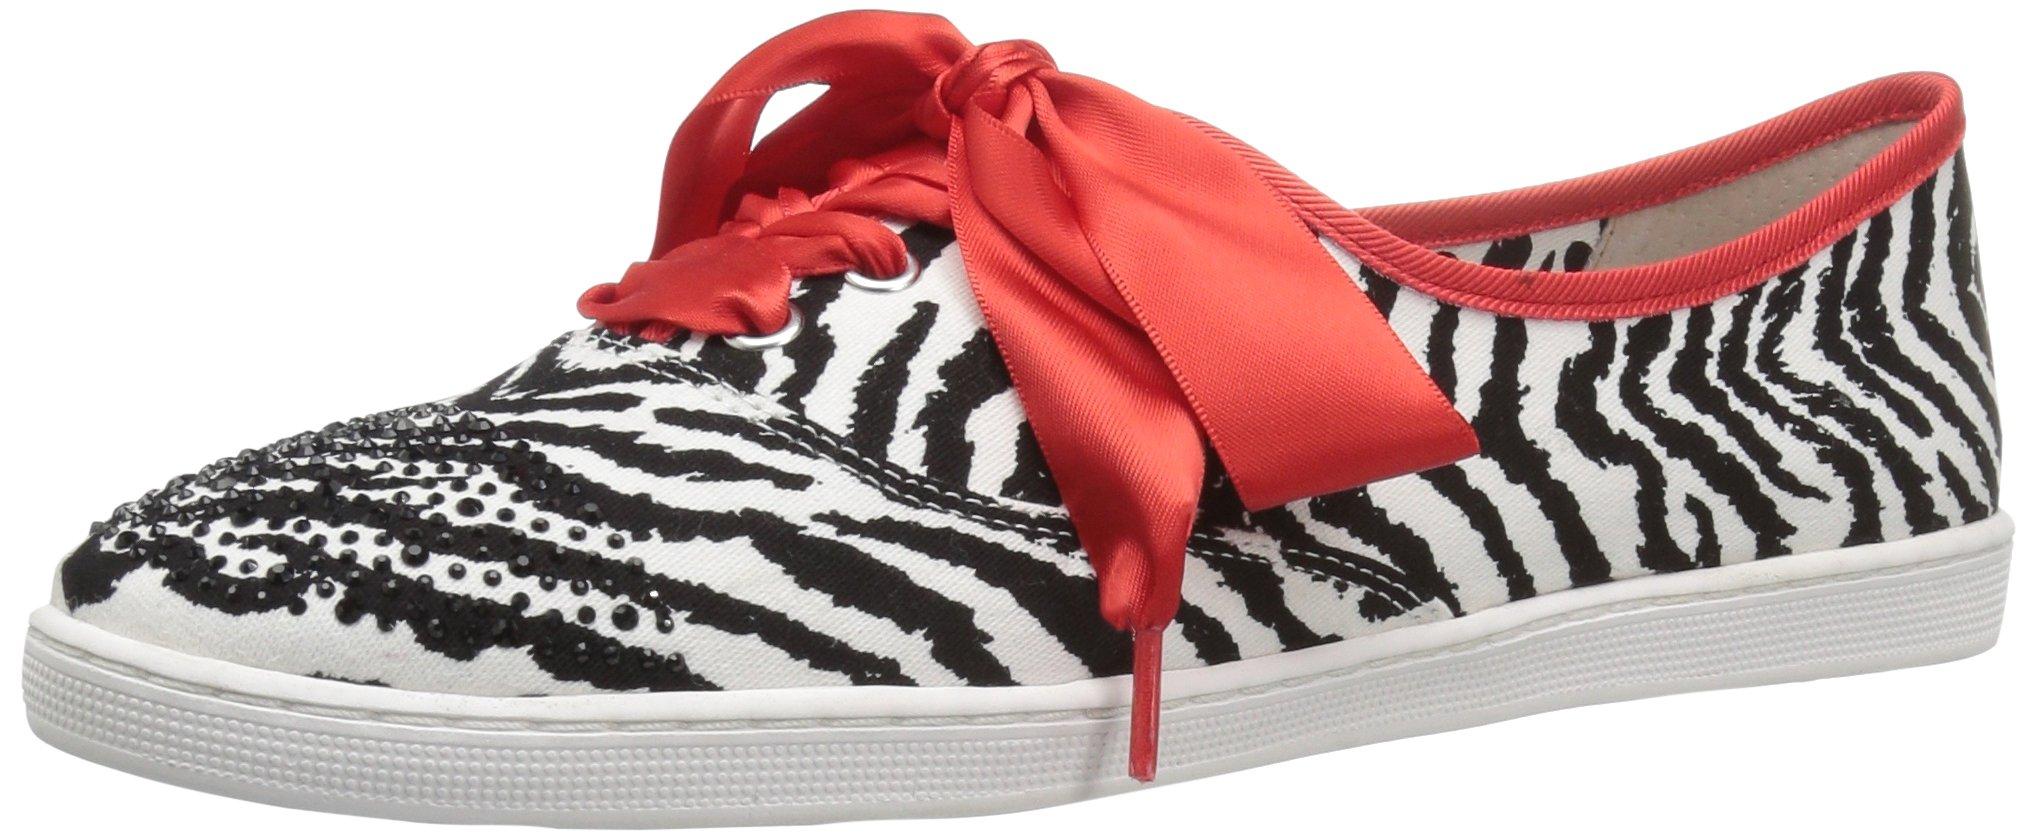 J.Renee Women's Schooner Fashion Sneaker, Black/White, 10 M US